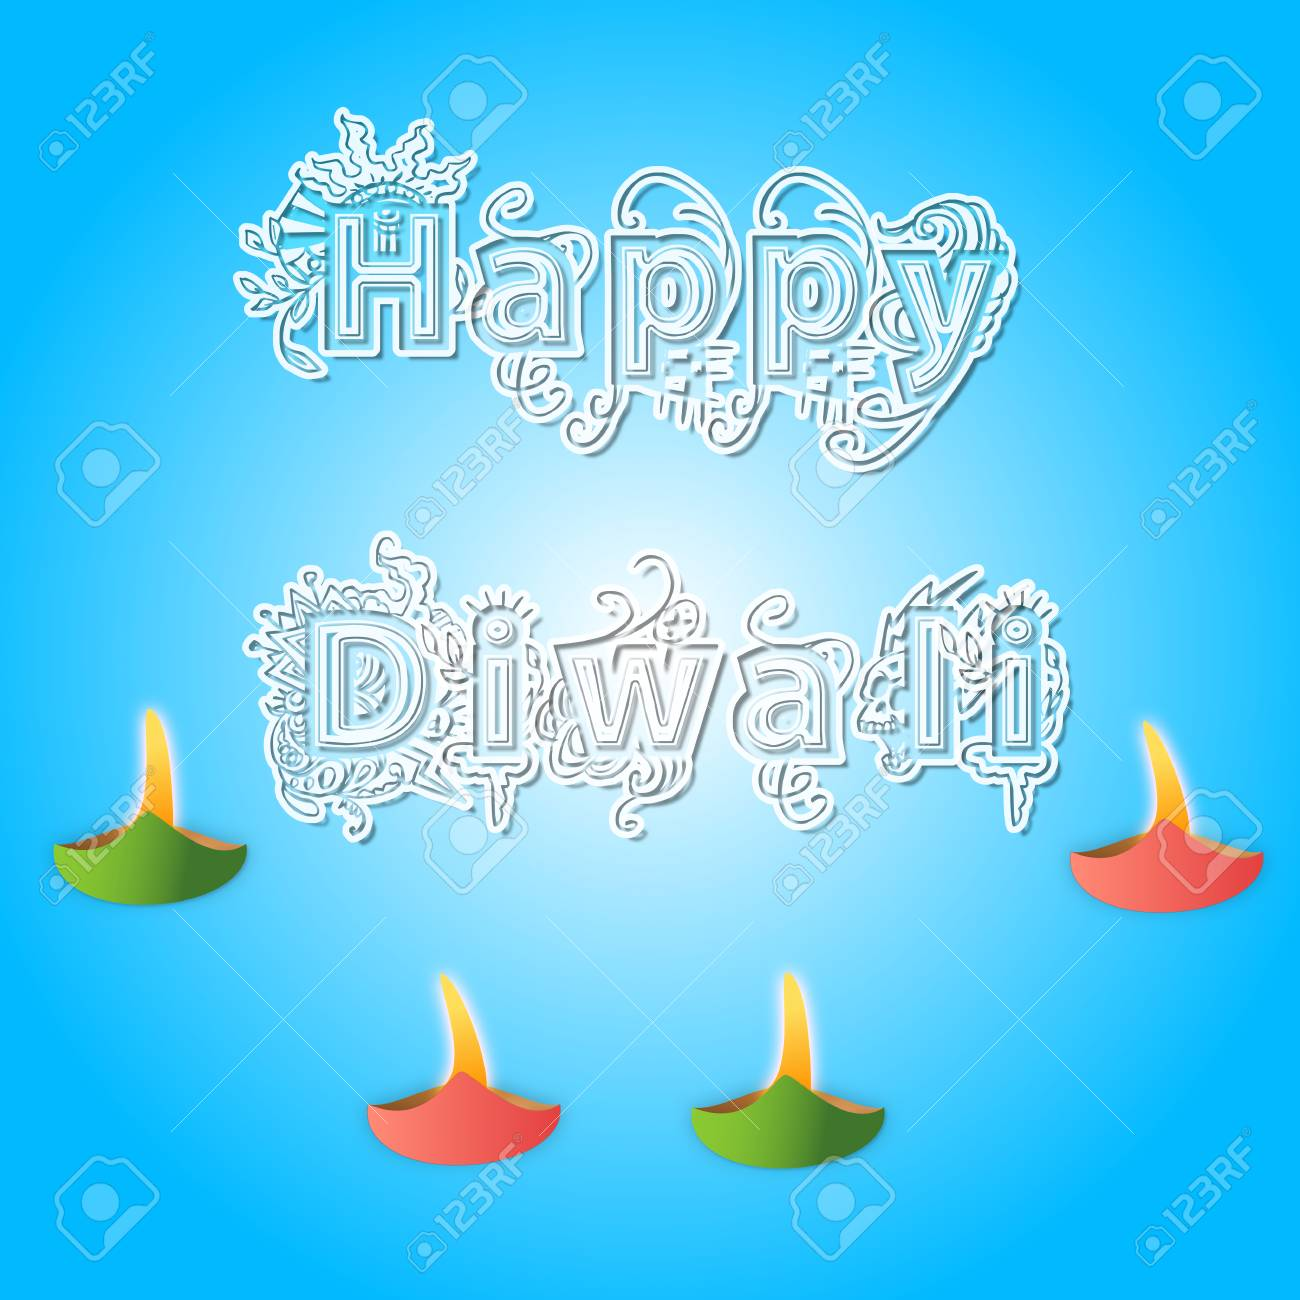 Happy diwali greetings with diwali lights stock photo picture and happy diwali greetings with diwali lights stock photo 75571280 m4hsunfo